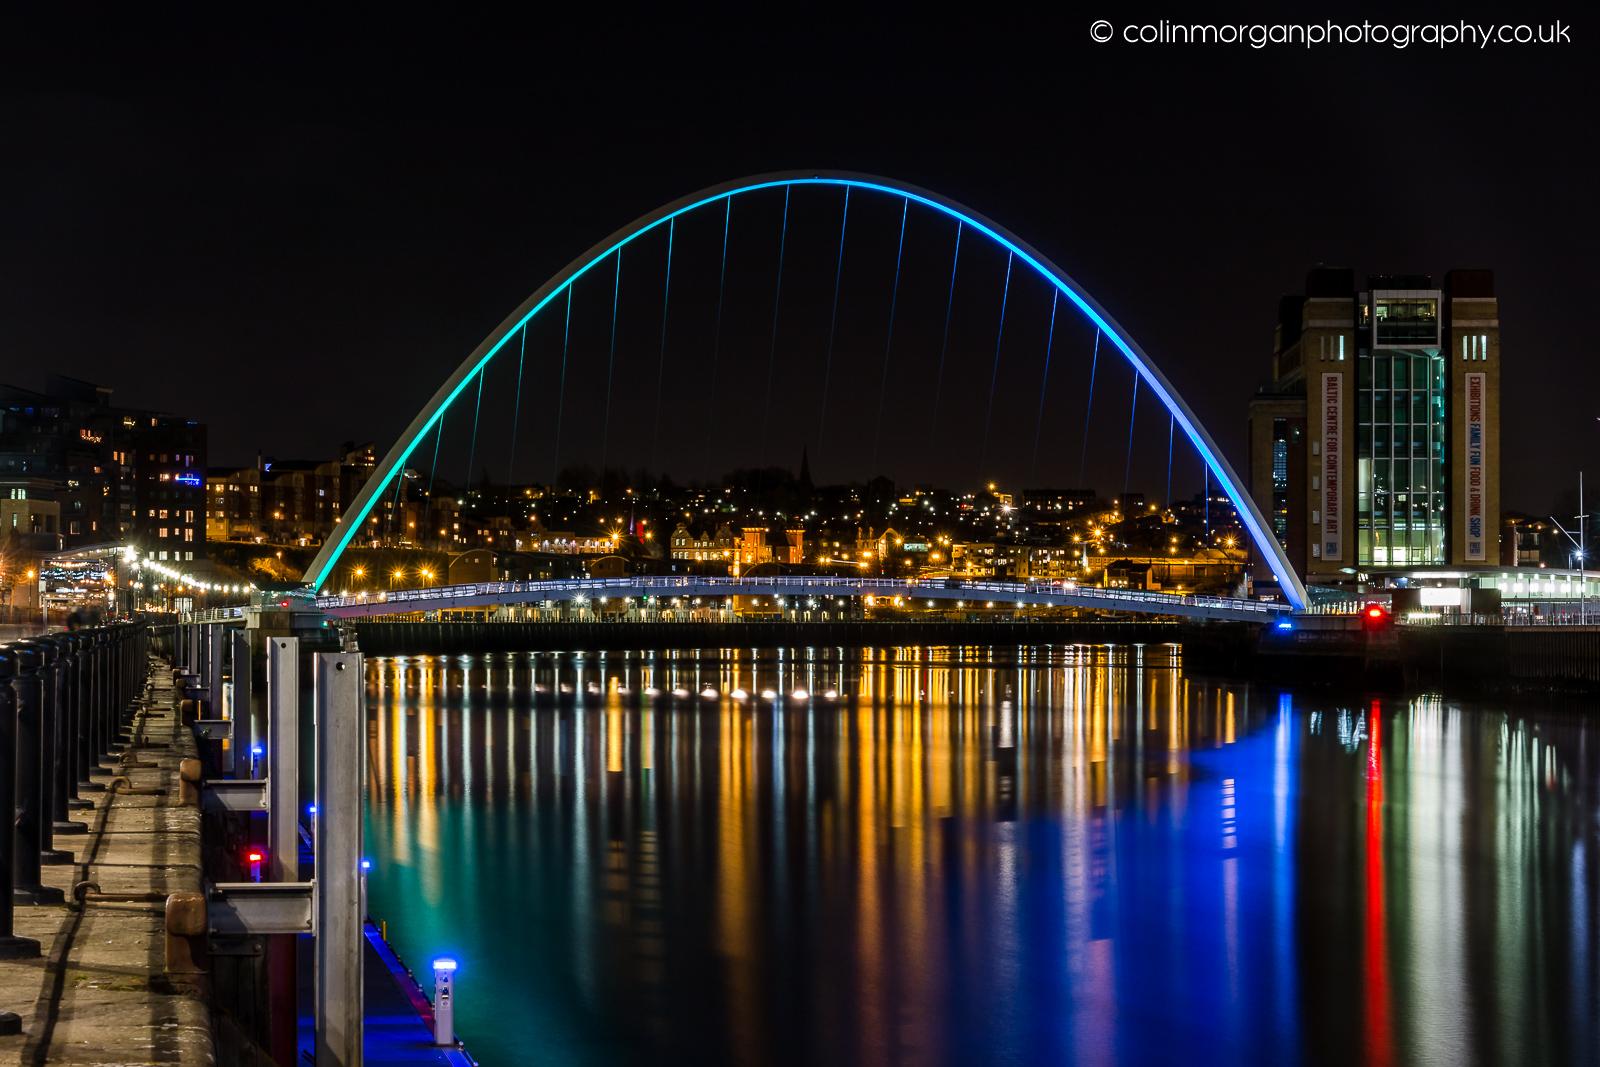 Millennium Bridge and The Baltic Gateshead. Colin Morgan Photography